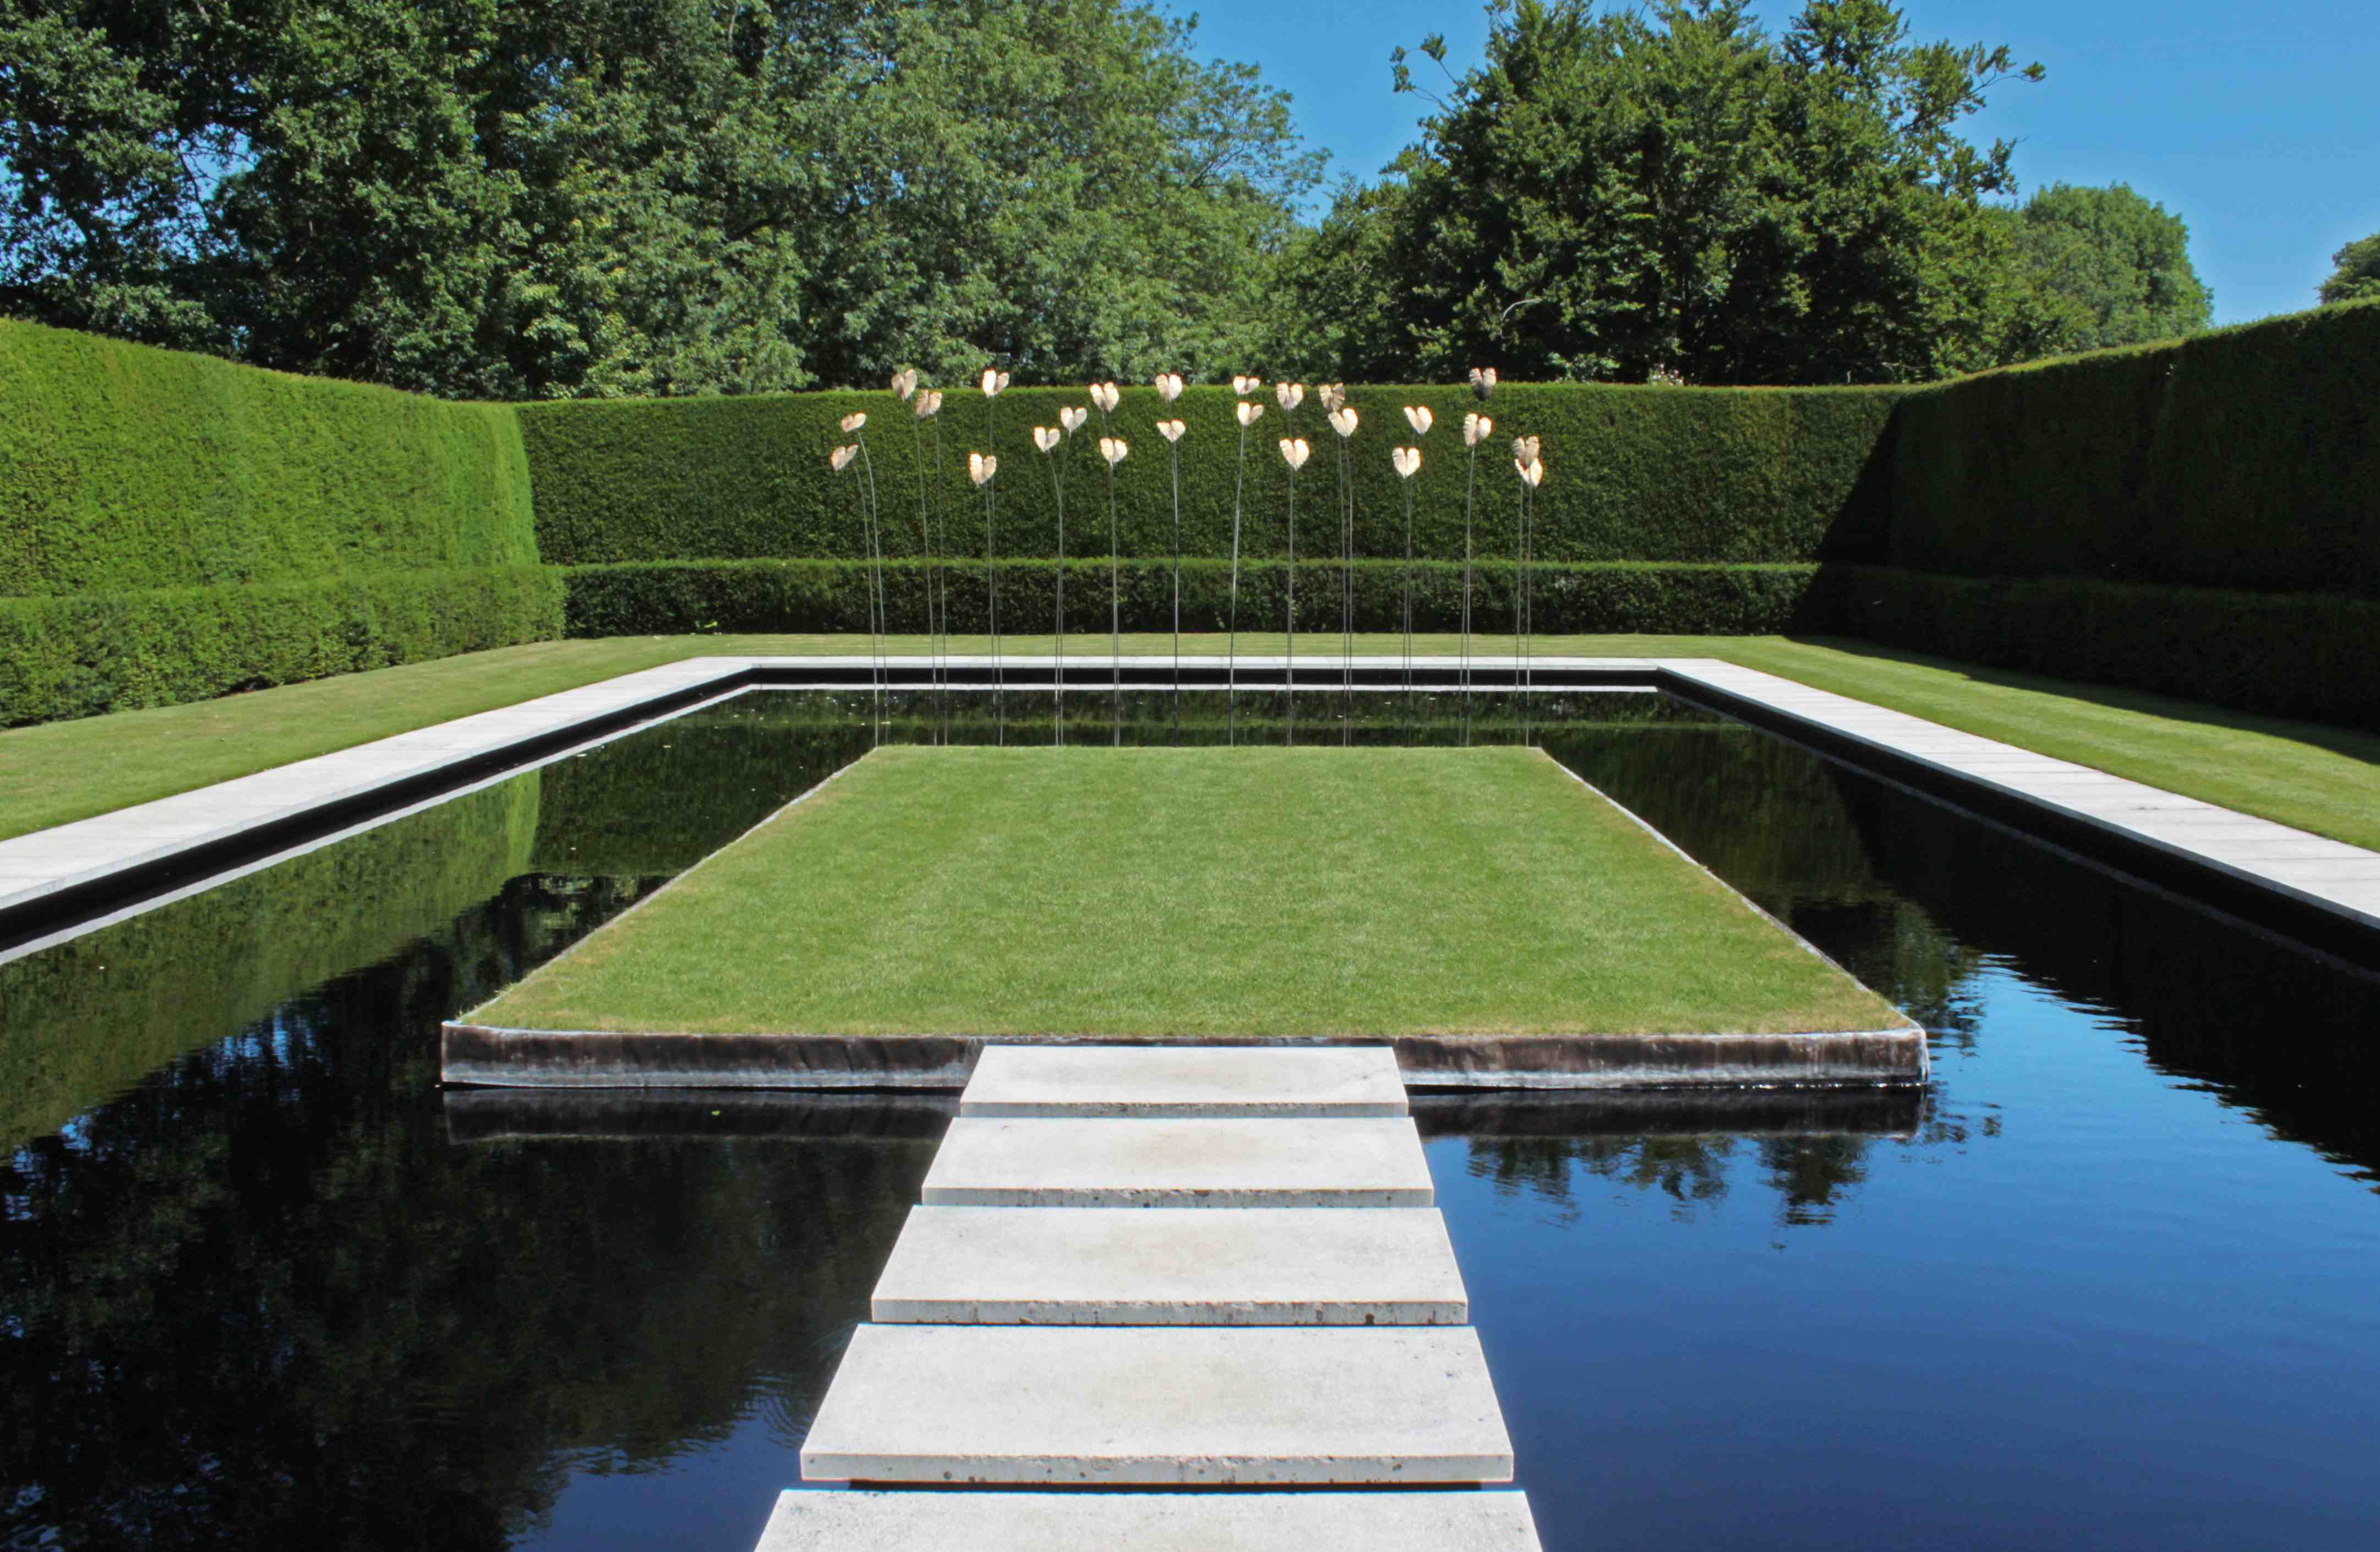 British Gardens History Philosophy And Design Tom Turner Jpg 4324 2819 Modern Garden Modern Landscape Design Pool Landscape Design